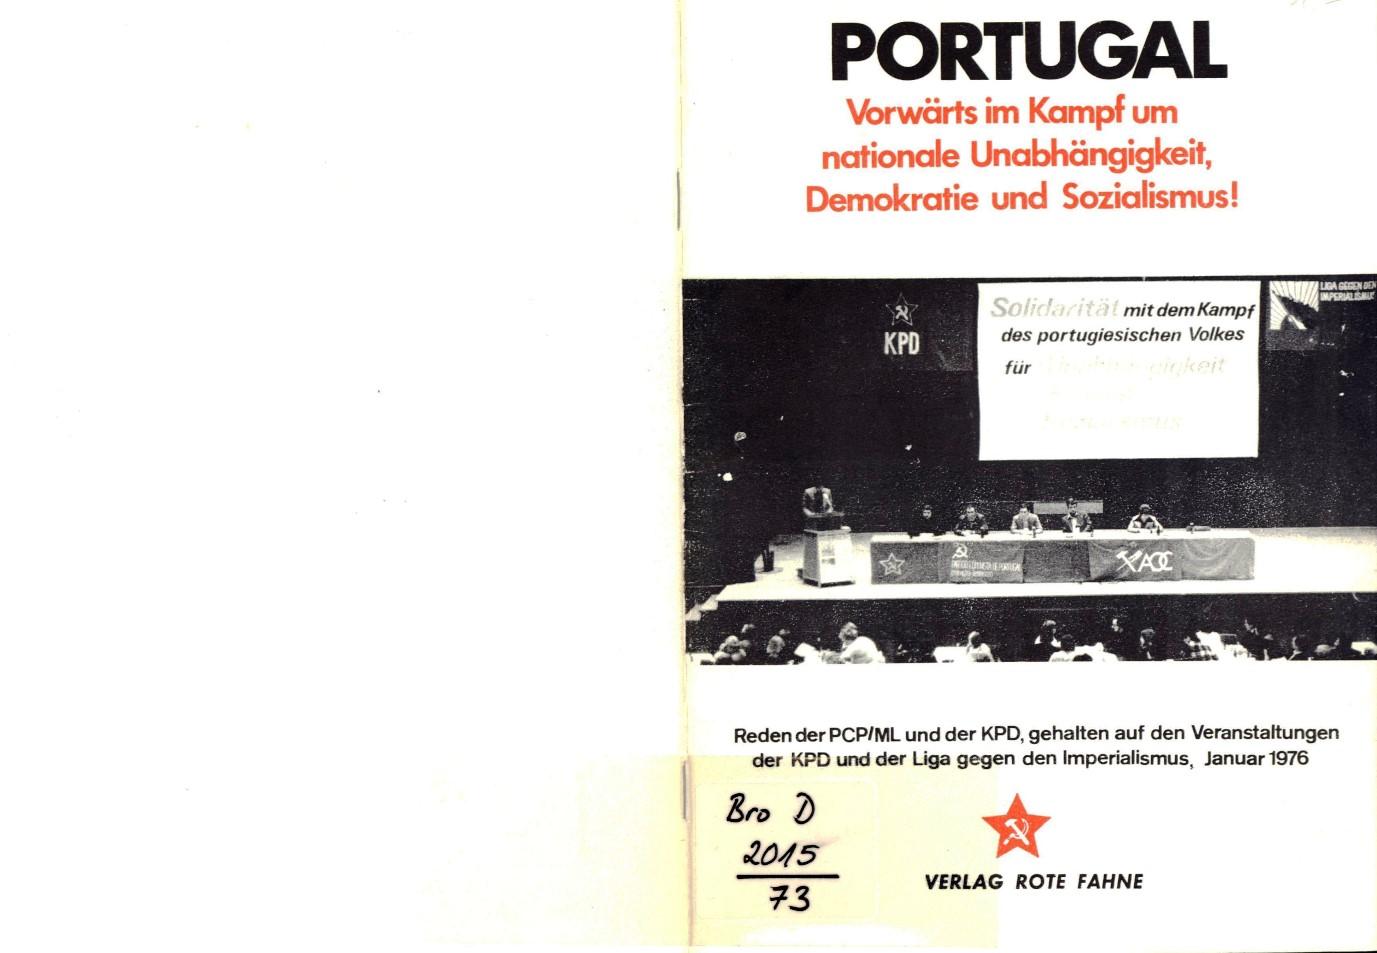 KPDAO_1976_Portugal_01